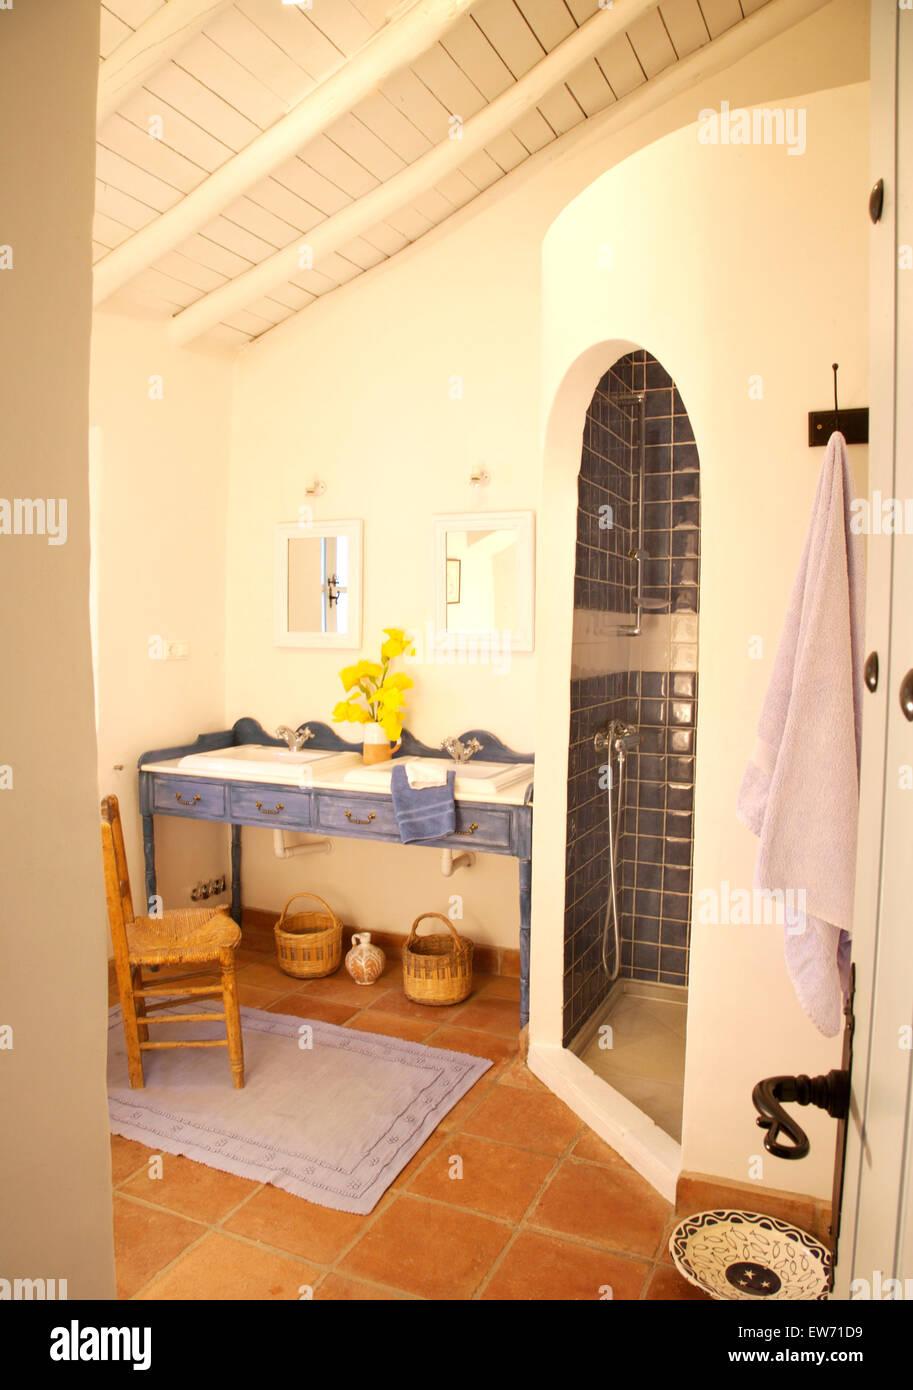 Adobe - douche de style rustique avec salle de bains en espagnol ...